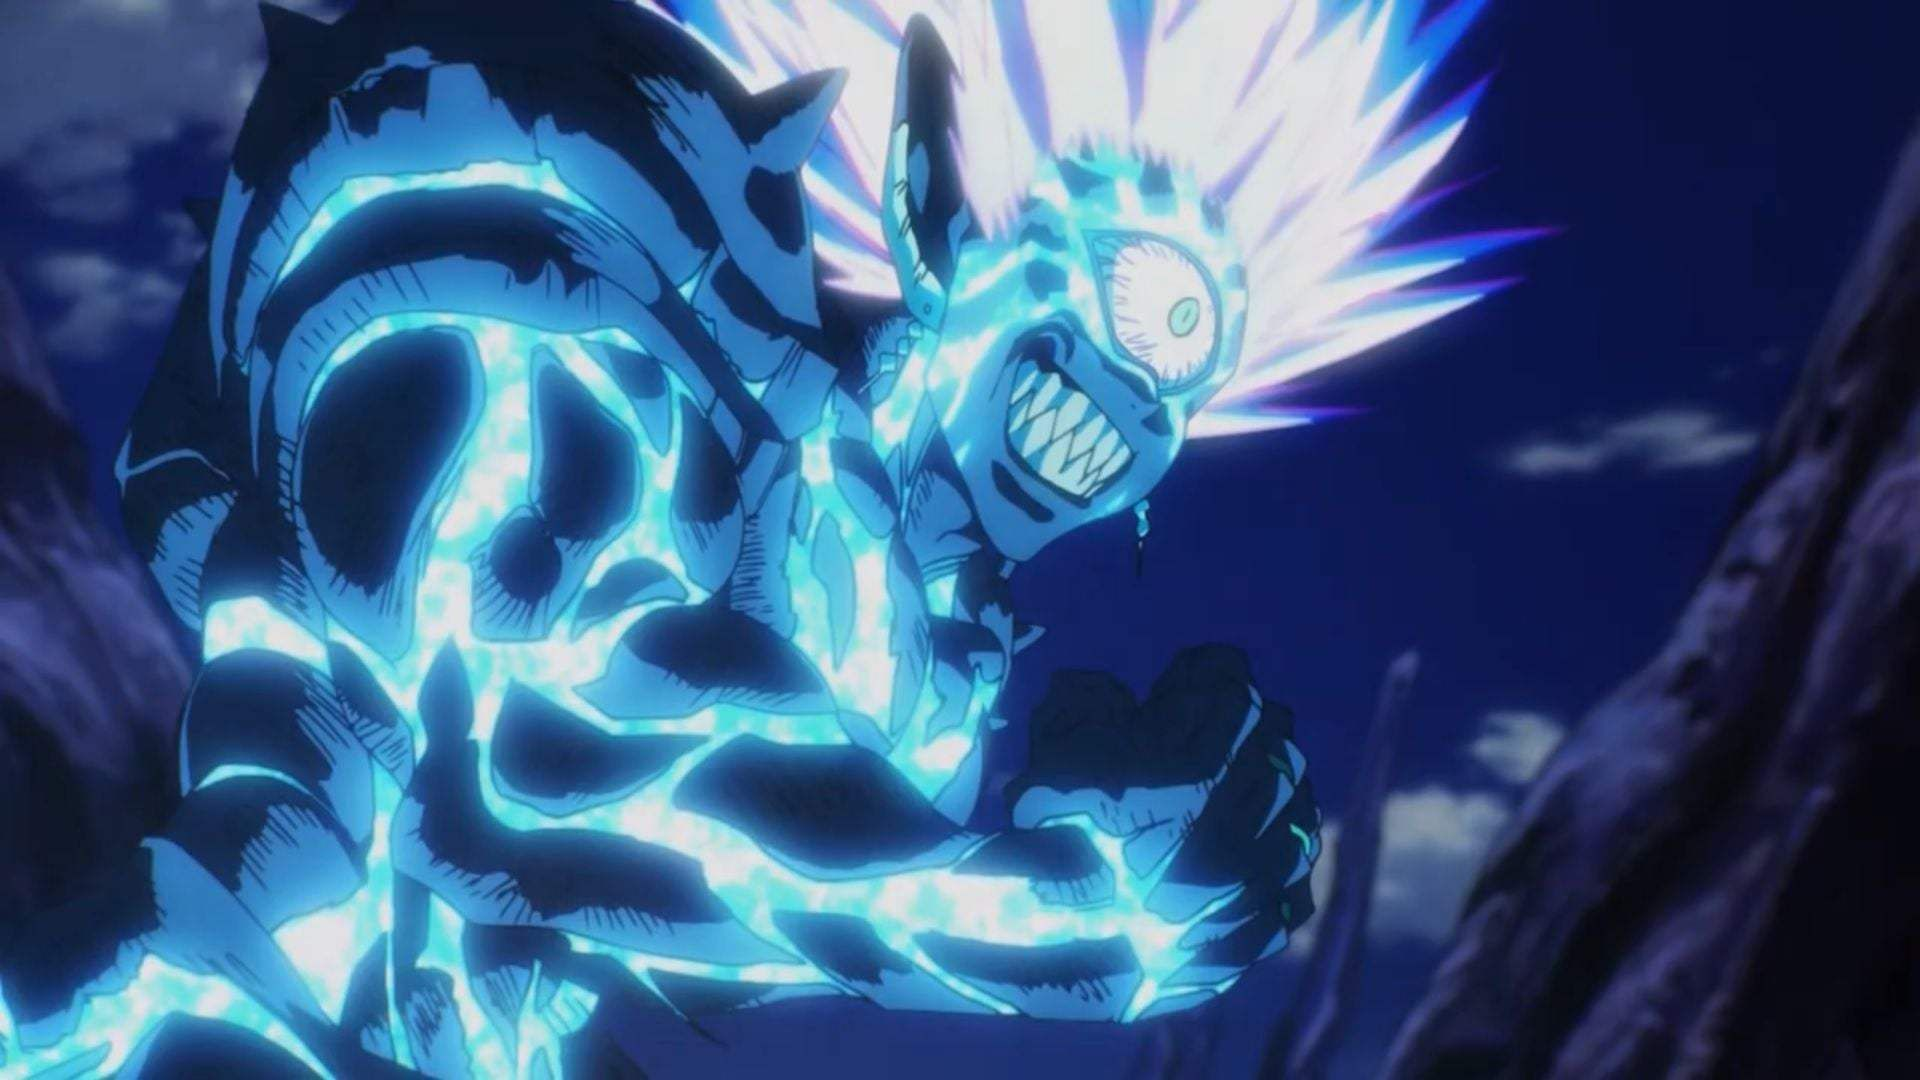 One Punch Man Saitama vs Lord Boros Full Fight Animated